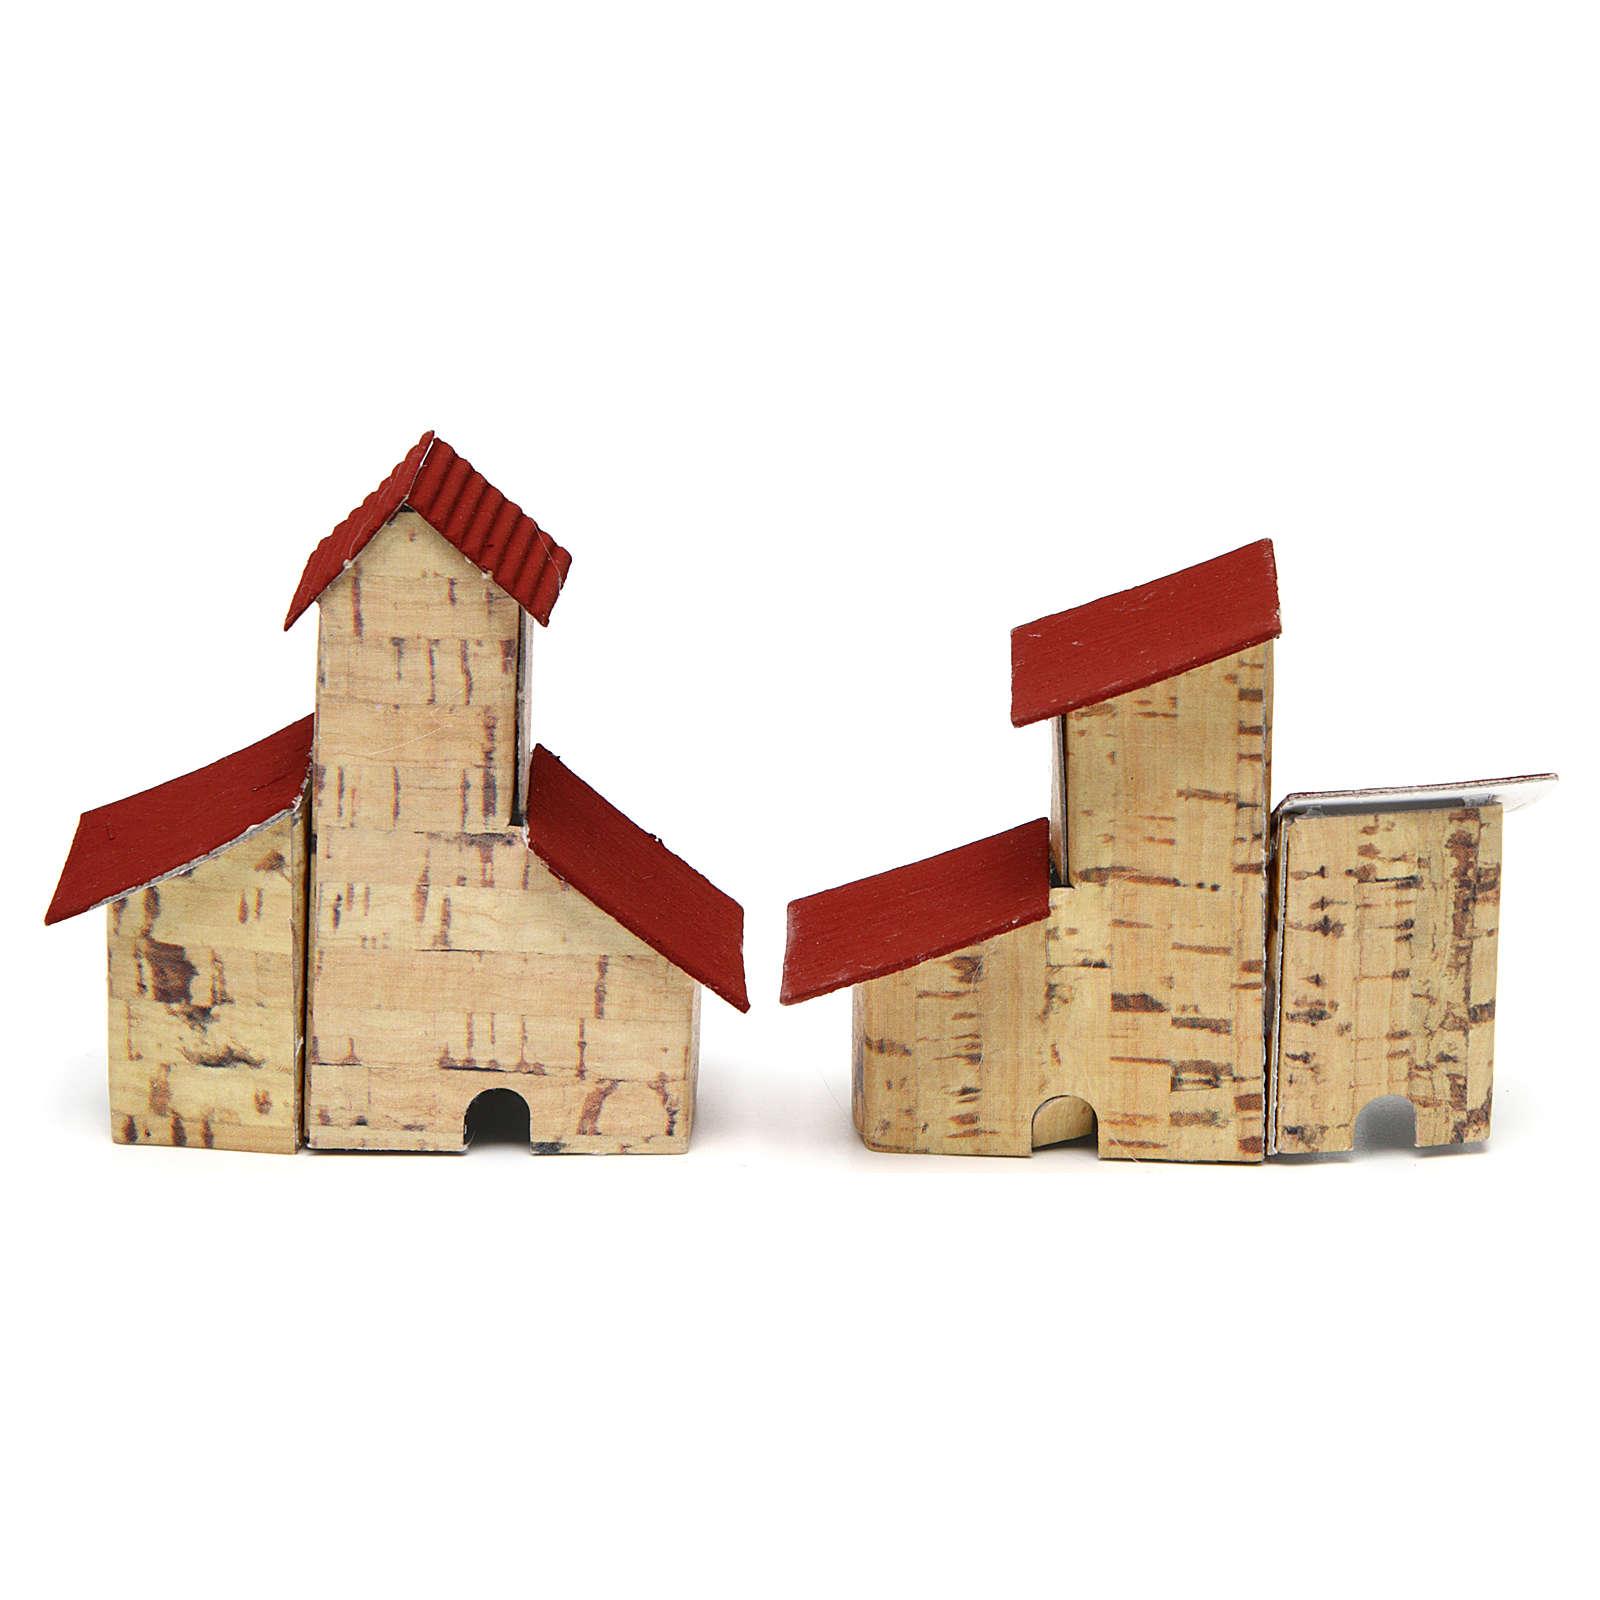 Case presepe 2 pz 6,5x4x7 cm 4